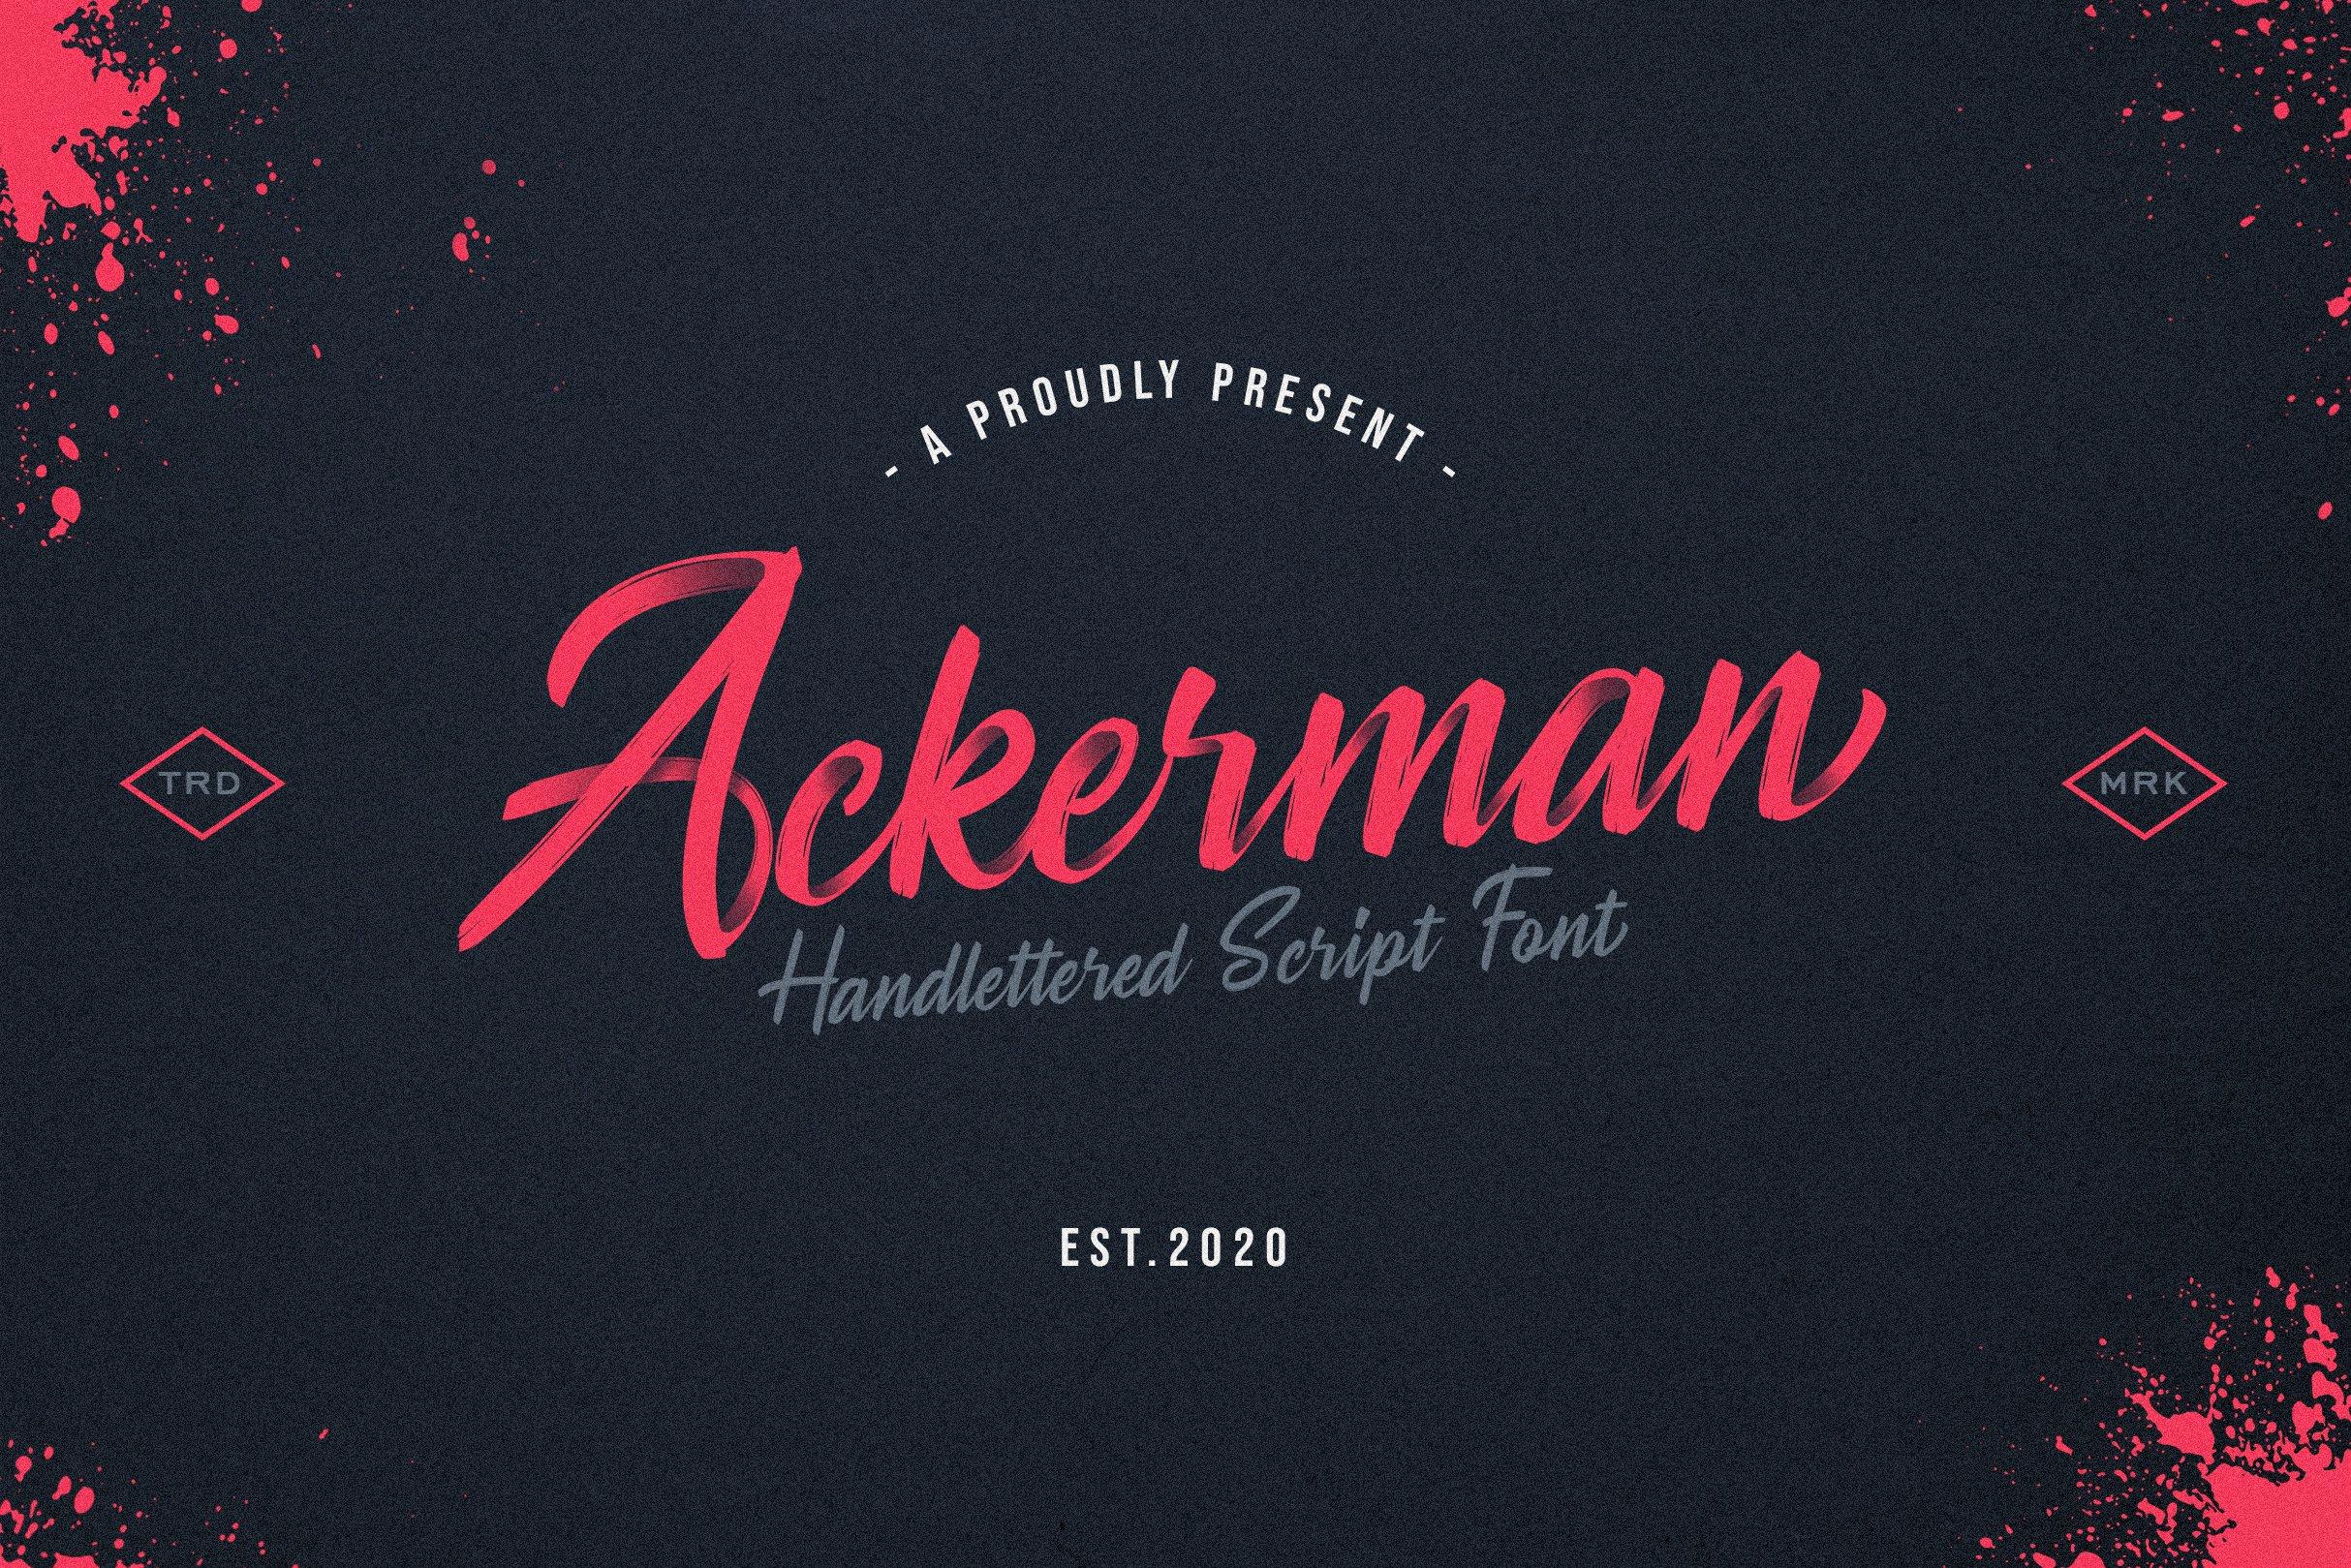 Ackerman Handlettered Script Font example image 1